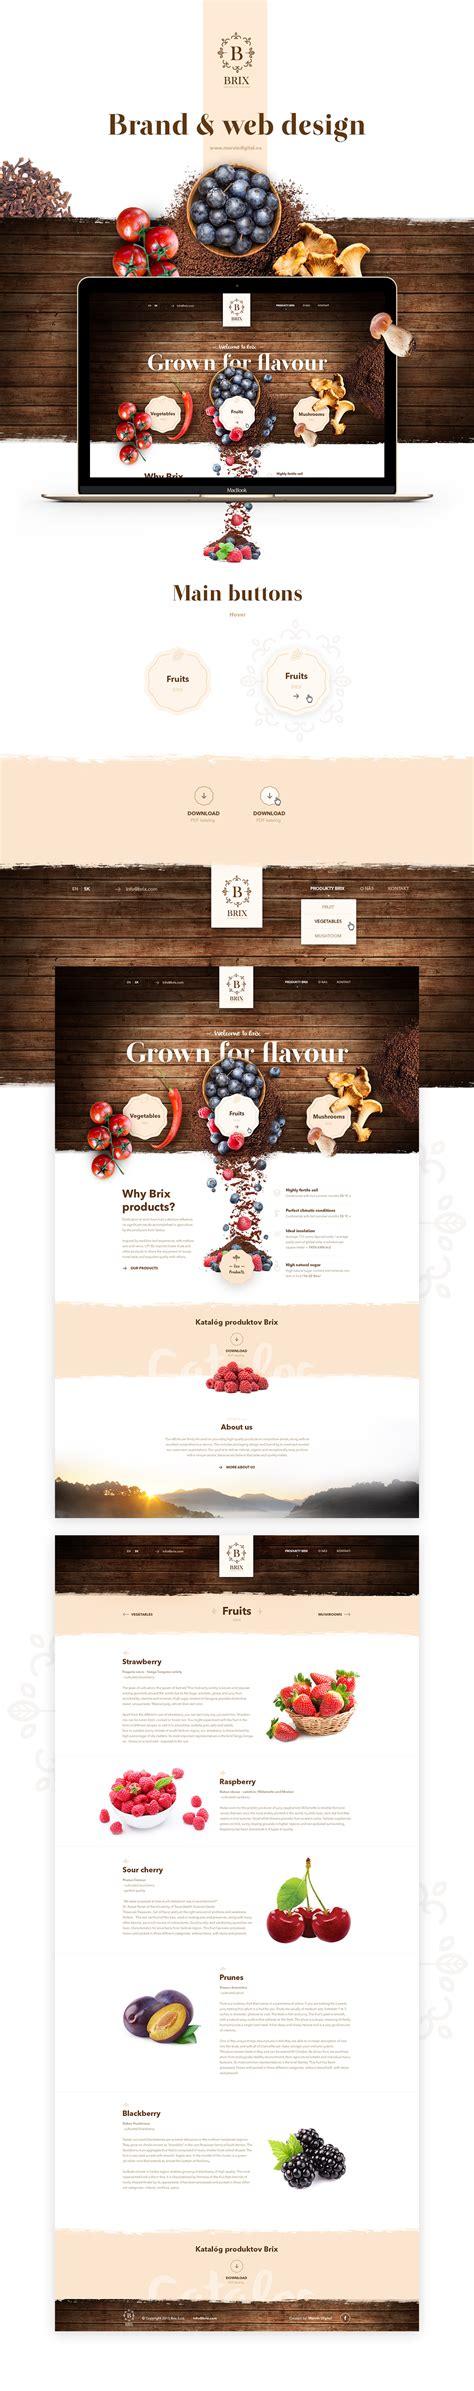 web layout behance web design on pinterest web design web design layouts